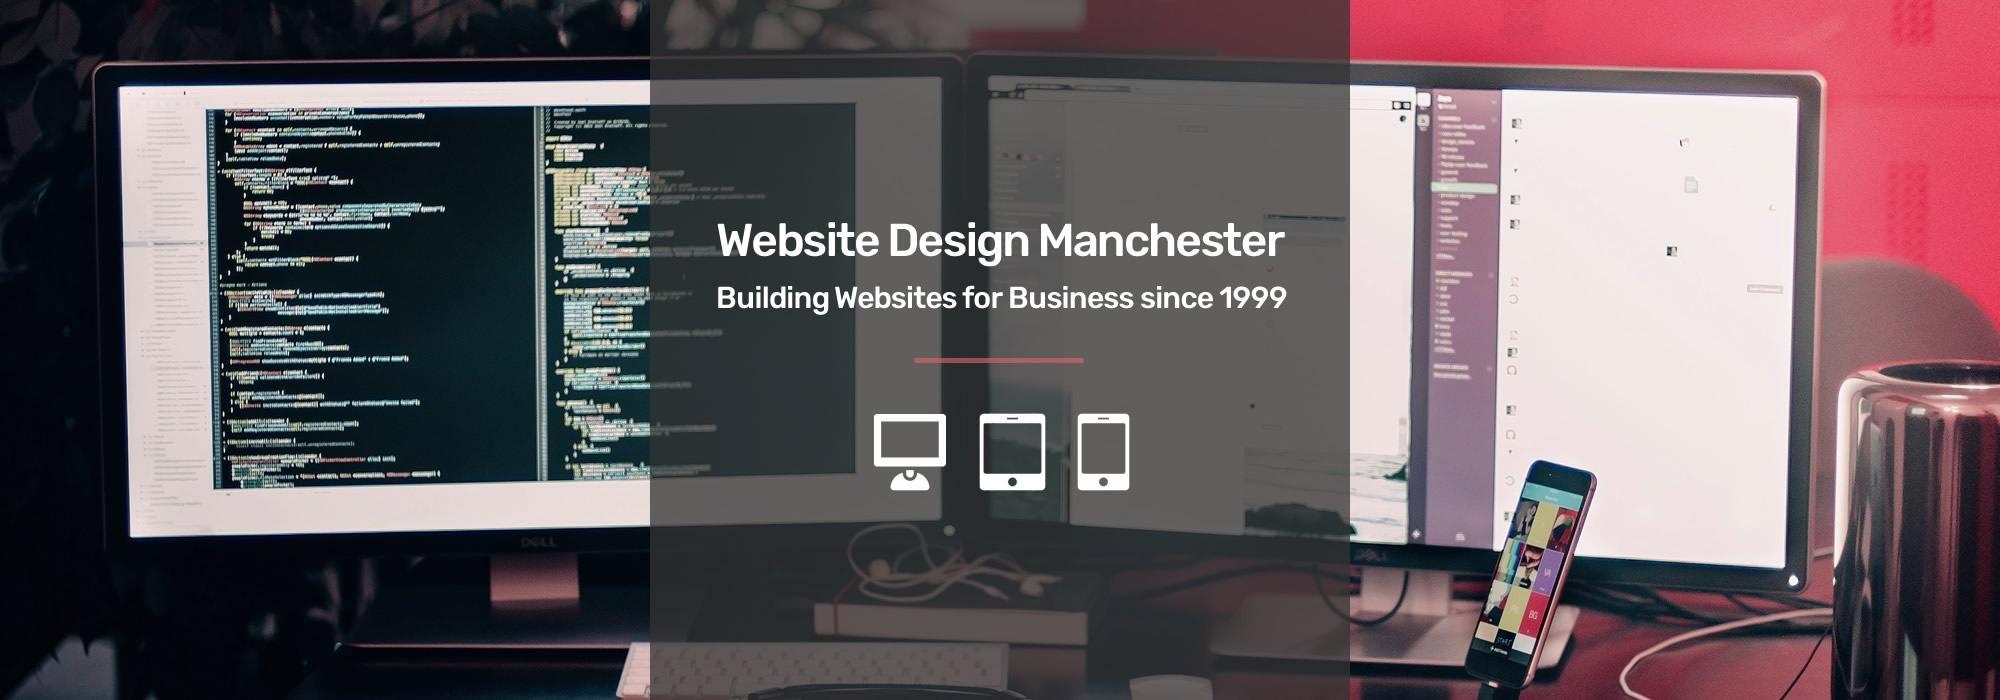 Web Design Manchester